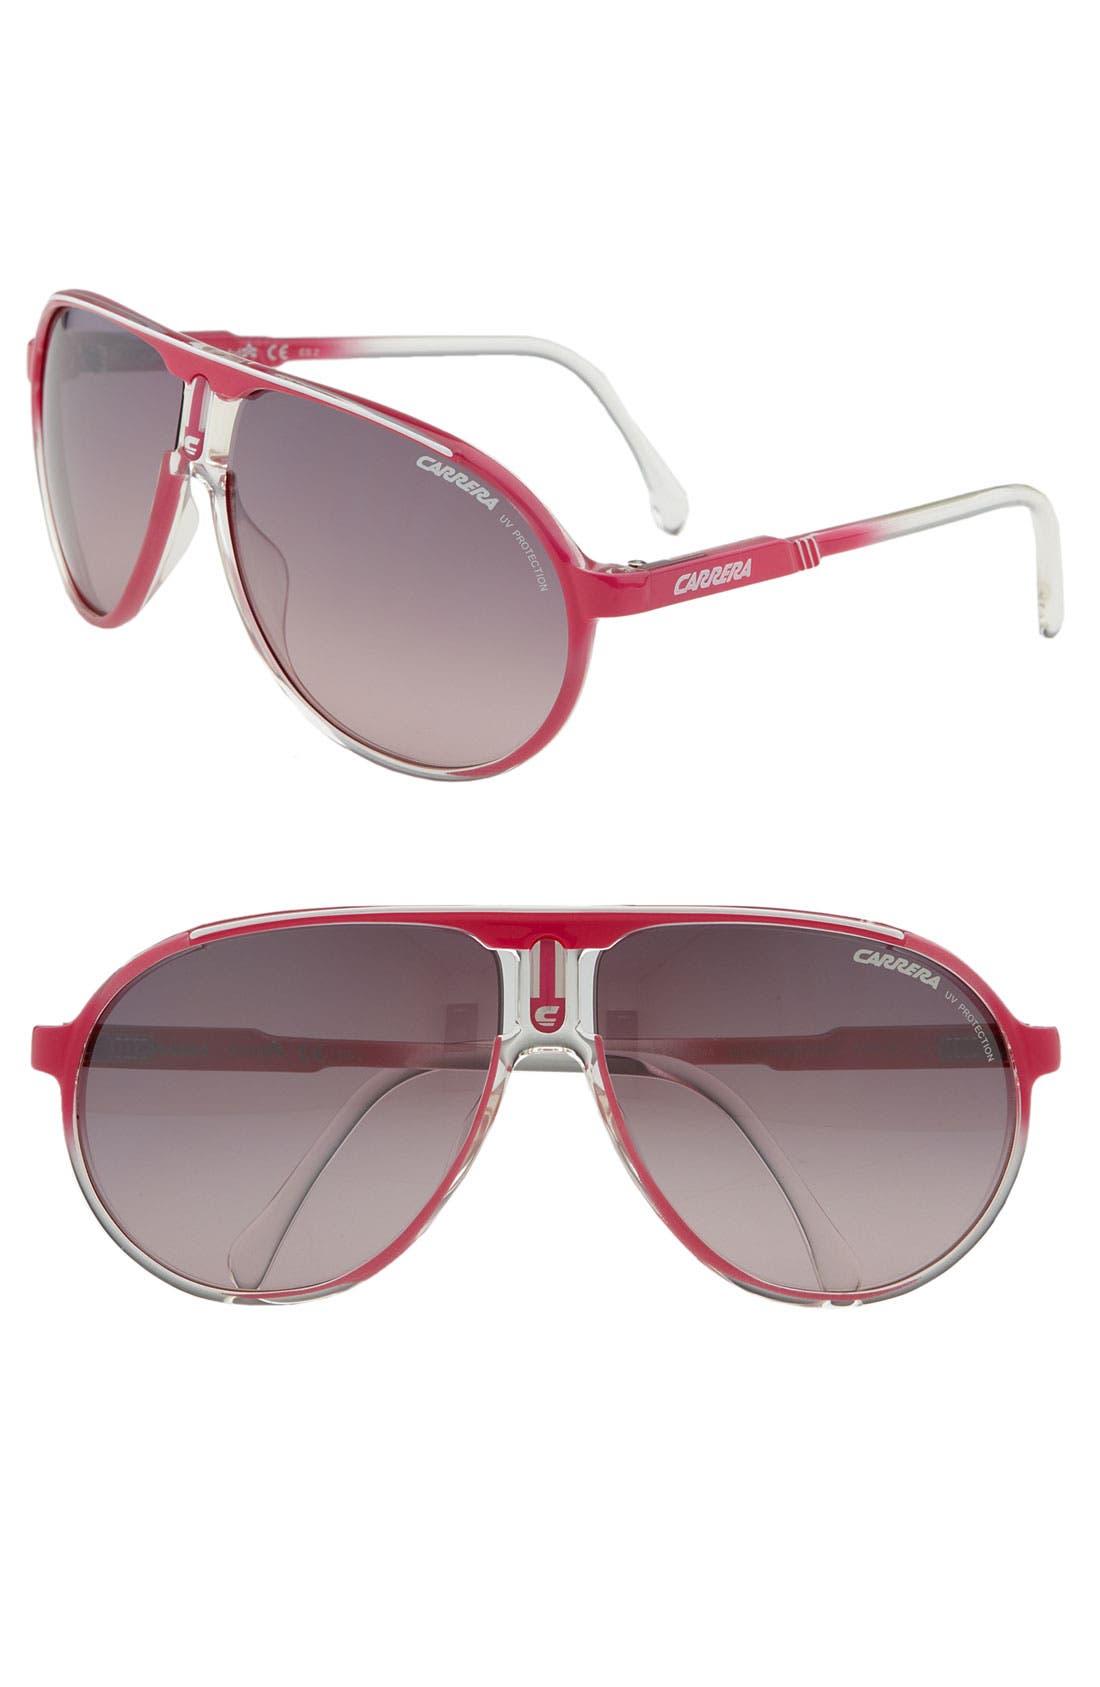 Alternate Image 1 Selected - Carrera Eyewear 'Champion' 62mm Round Aviator Sunglasses